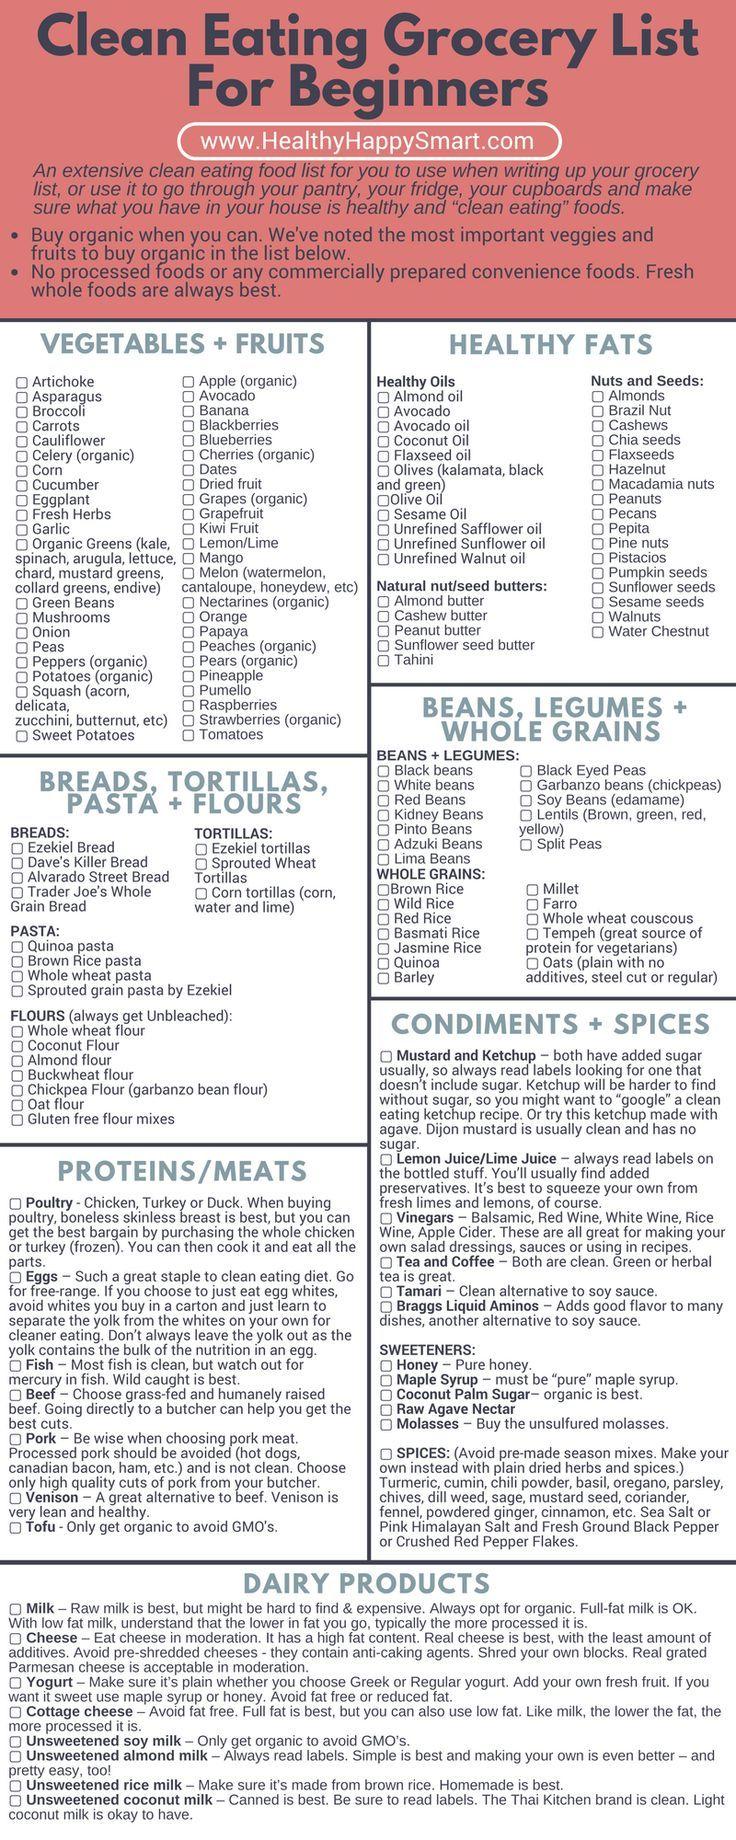 Clean Eating Grocery List Healthy Food List Low Carb Foods Diets